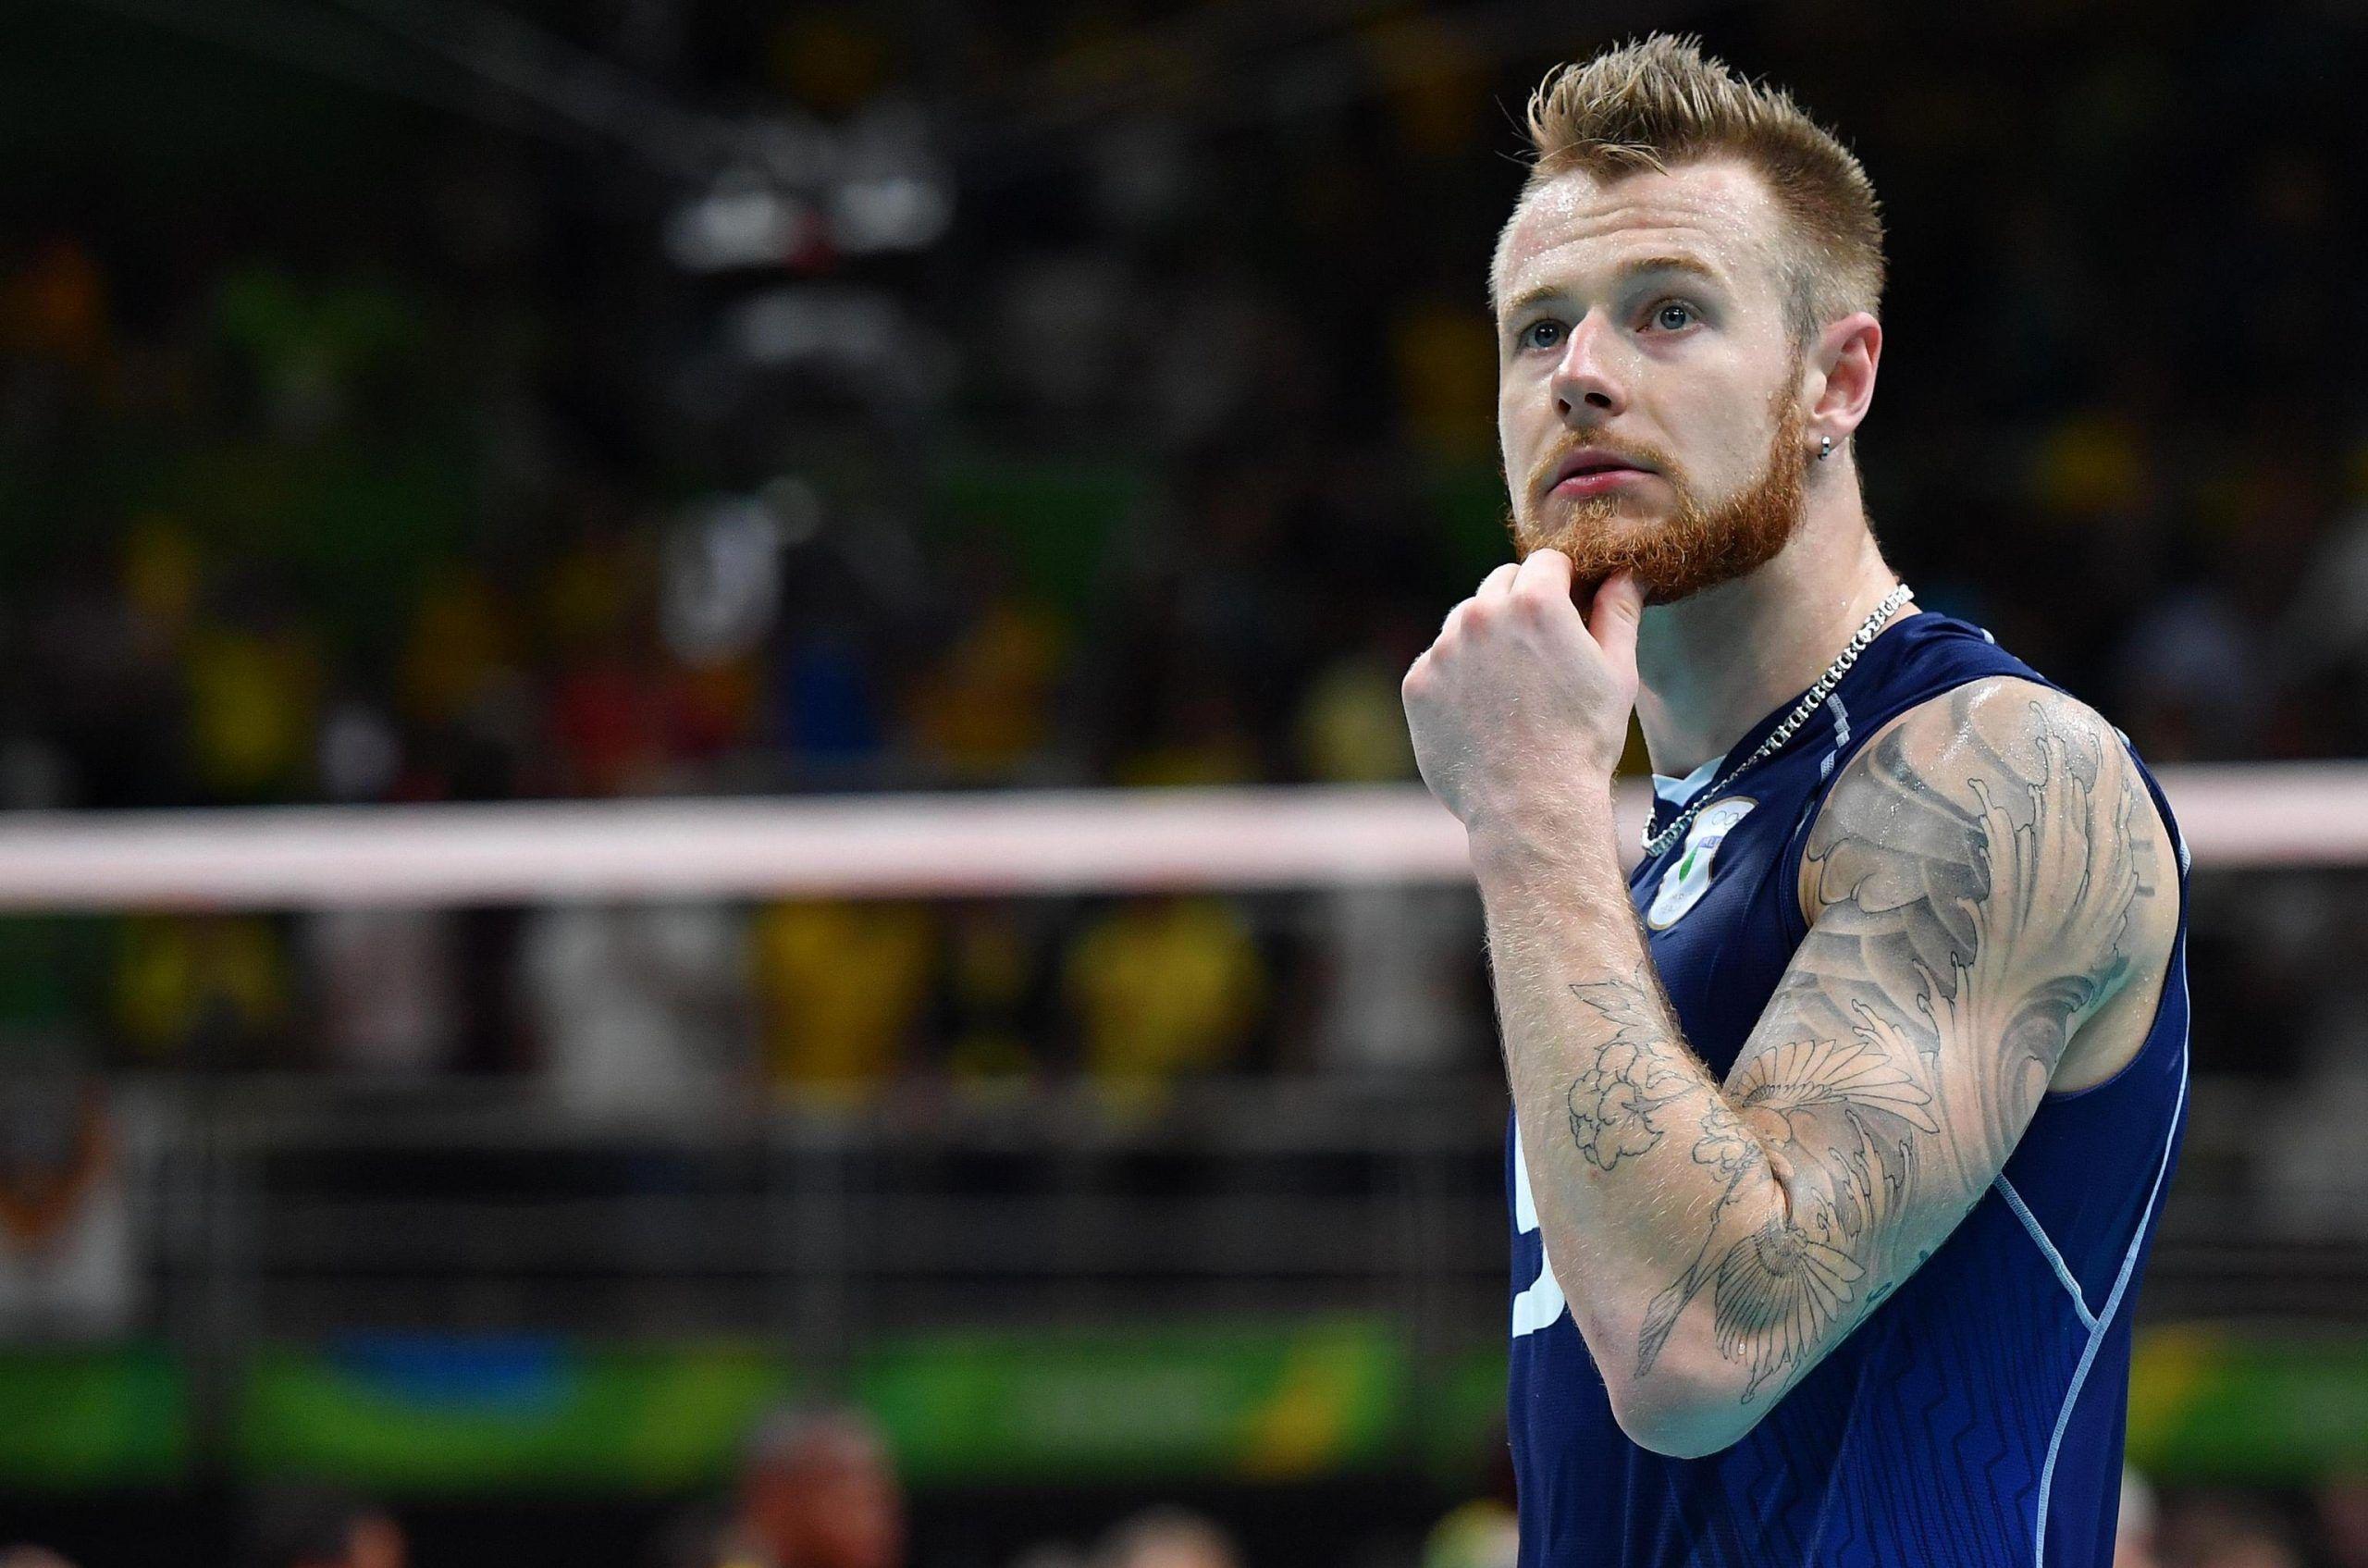 Star del Volley, Ivan Zaytsev vaccina la figlia i no vax lo insultano sui social